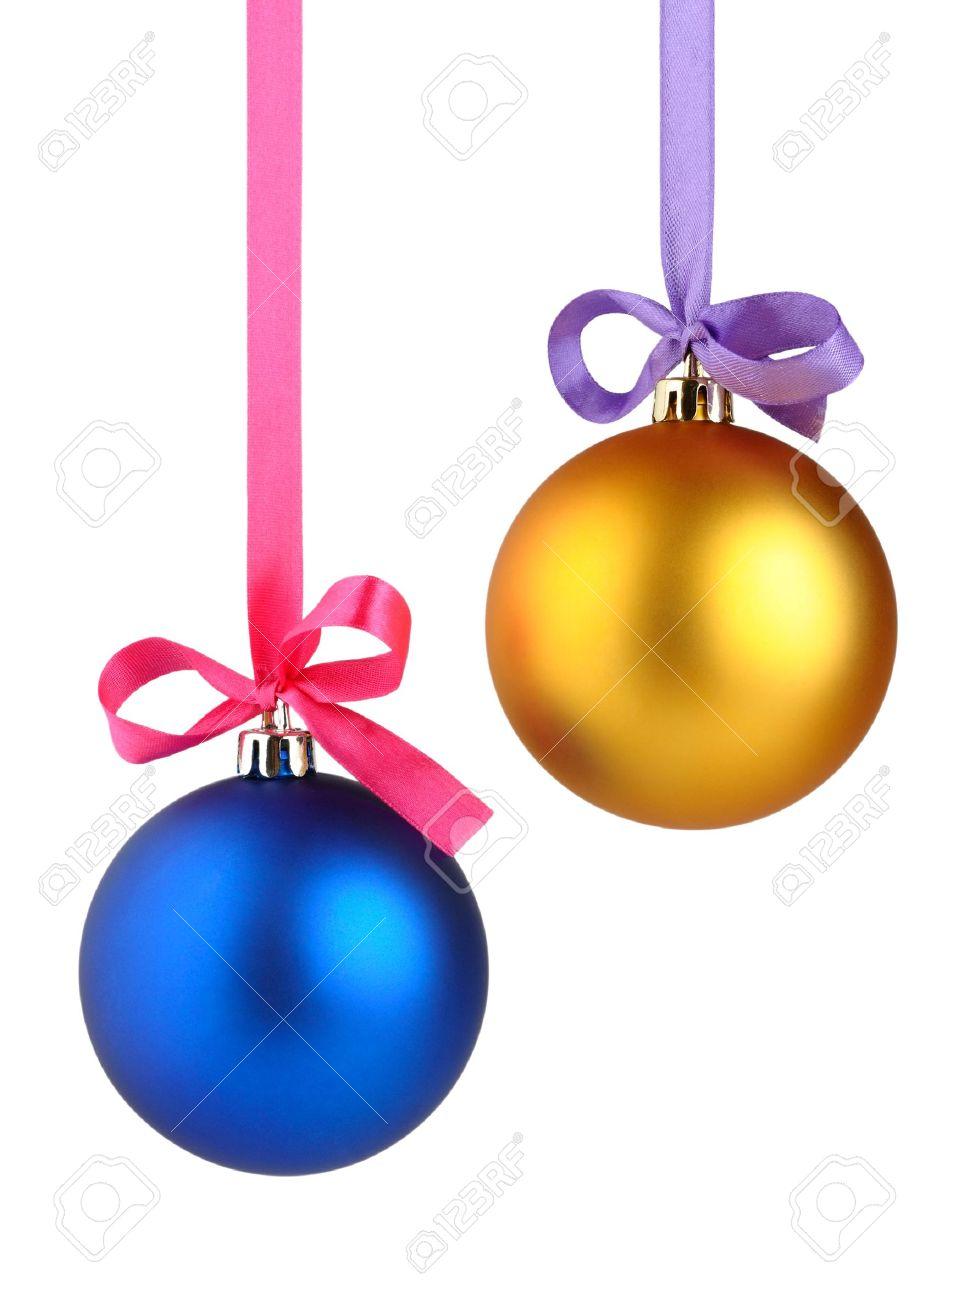 Christmas balls hanging on ribbon isolated on white background - 10858229